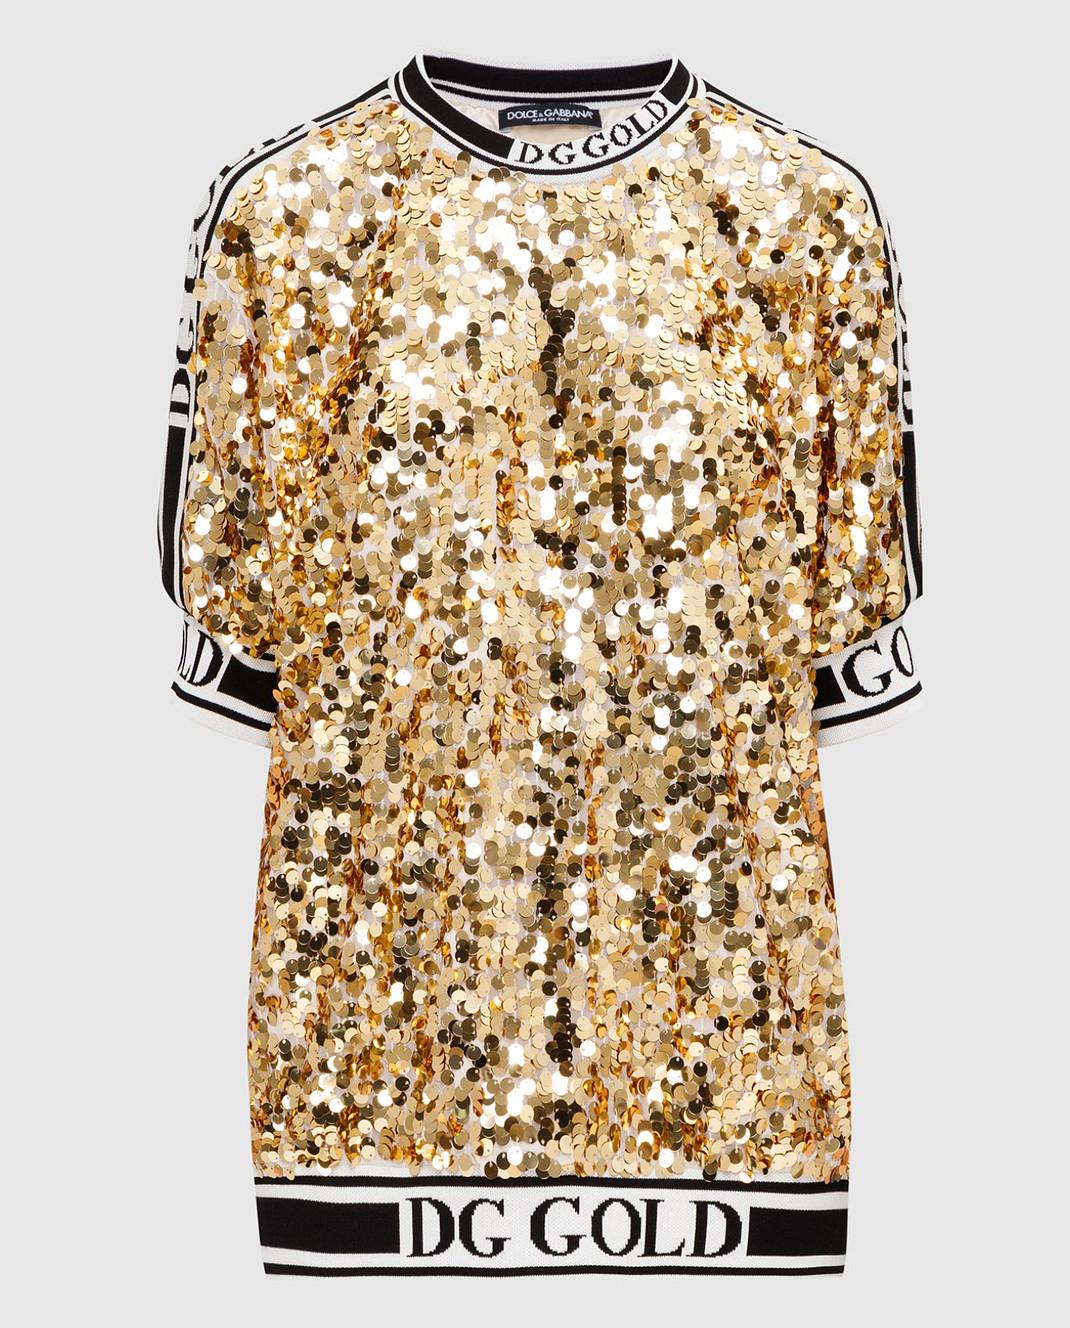 Dolce&Gabbana Золотистая футболка изображение 1